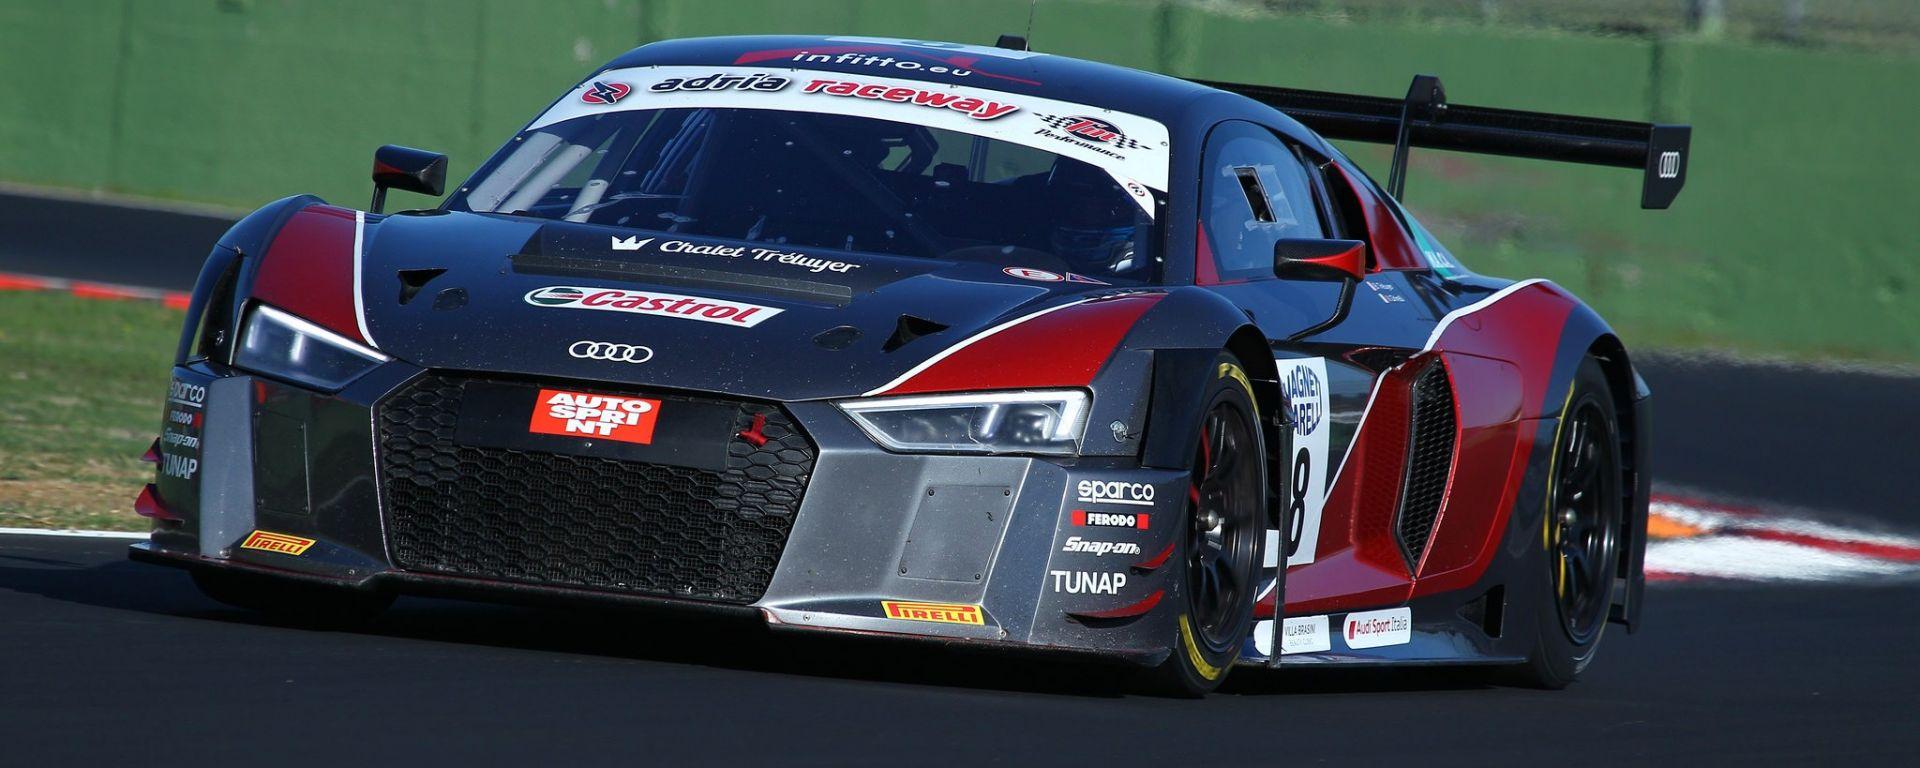 L'Audi R8 LMS a Vallelunga